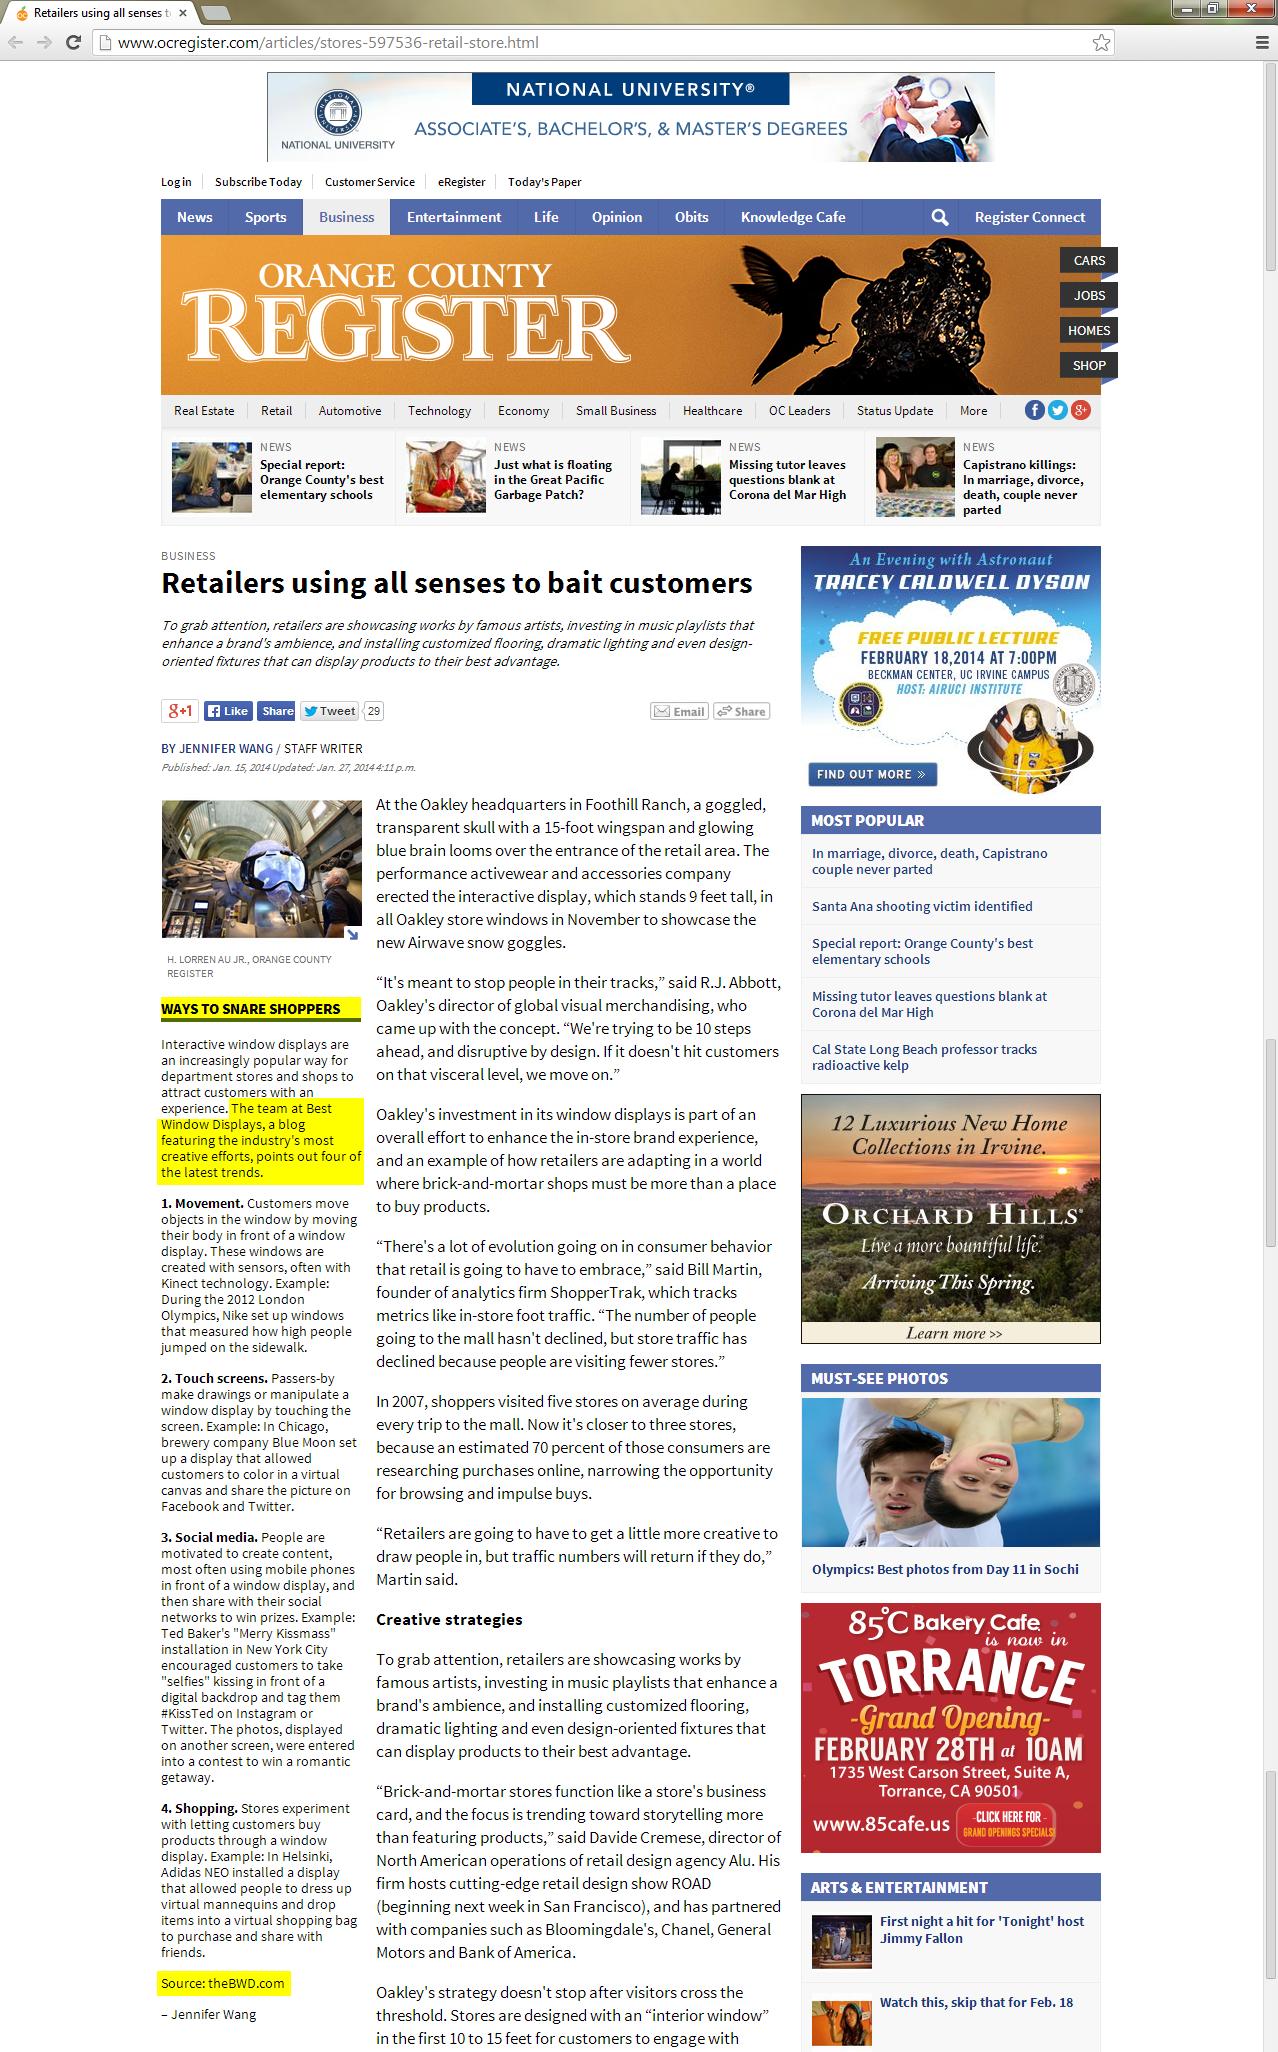 best-window-displays_press_orange-county-register_2014-01-15_ways-to-snare-shoppers